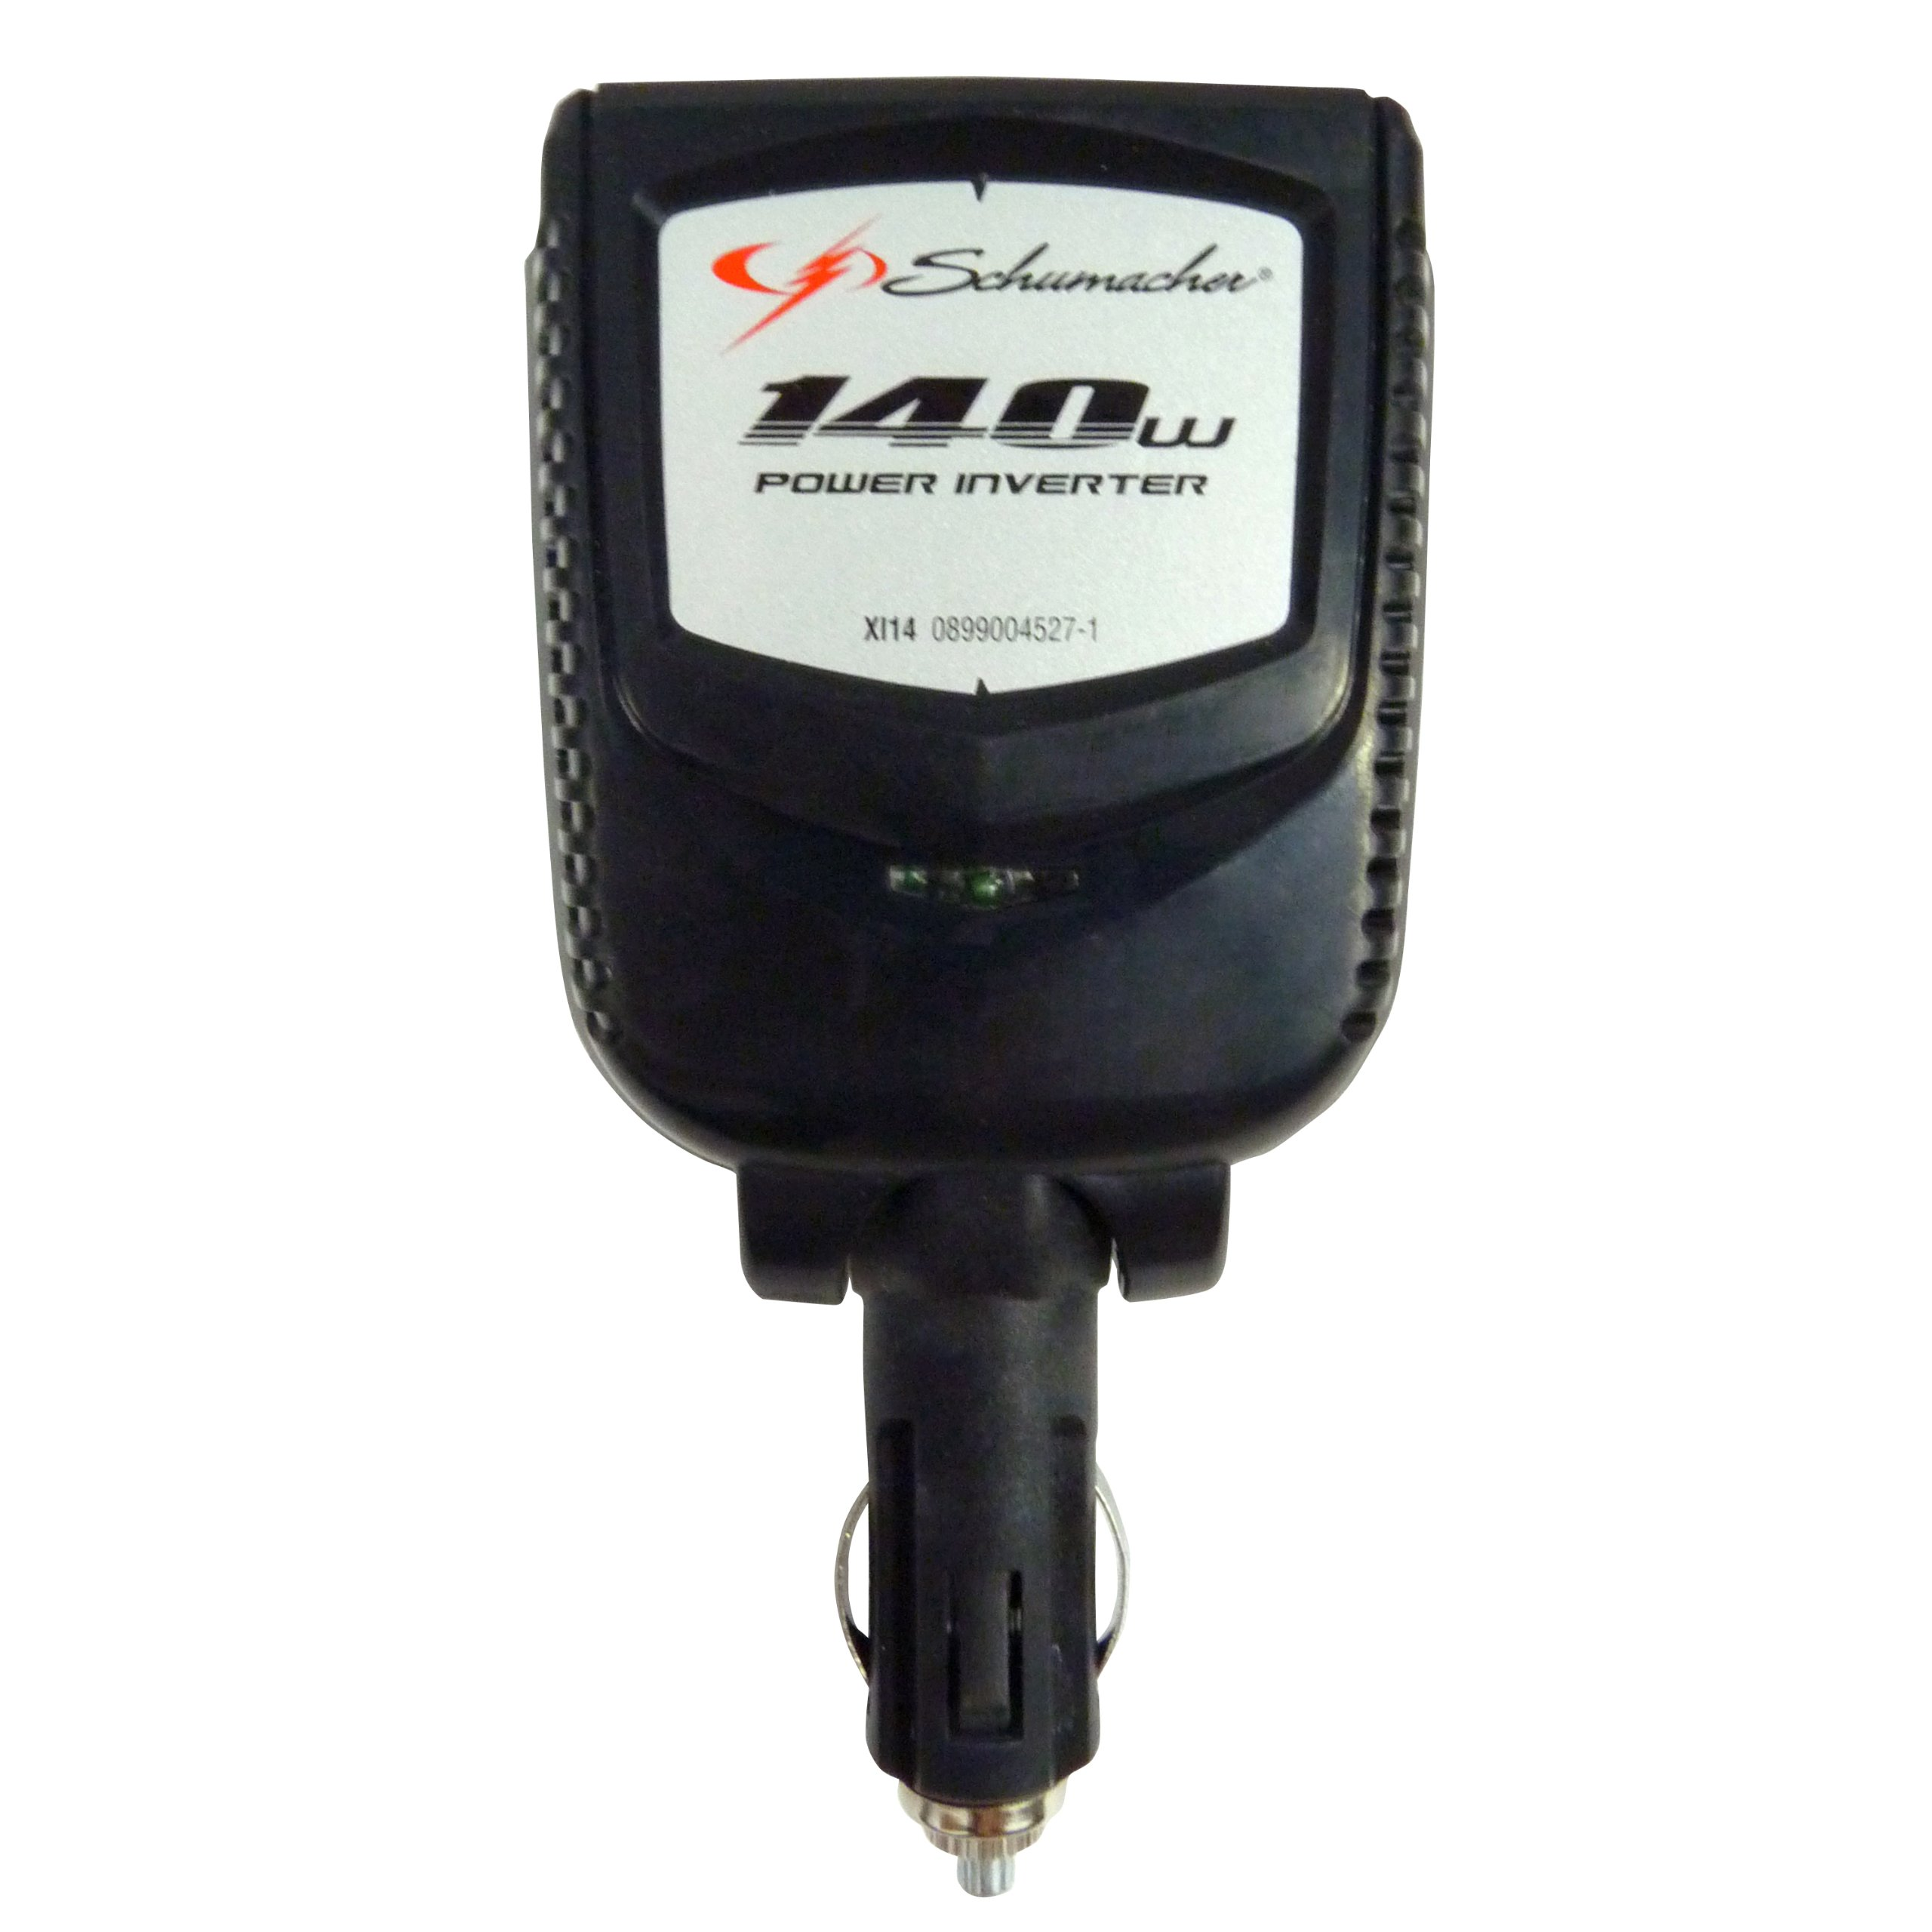 Schumacher XI14 140 Watt DC to AC Power Inverter